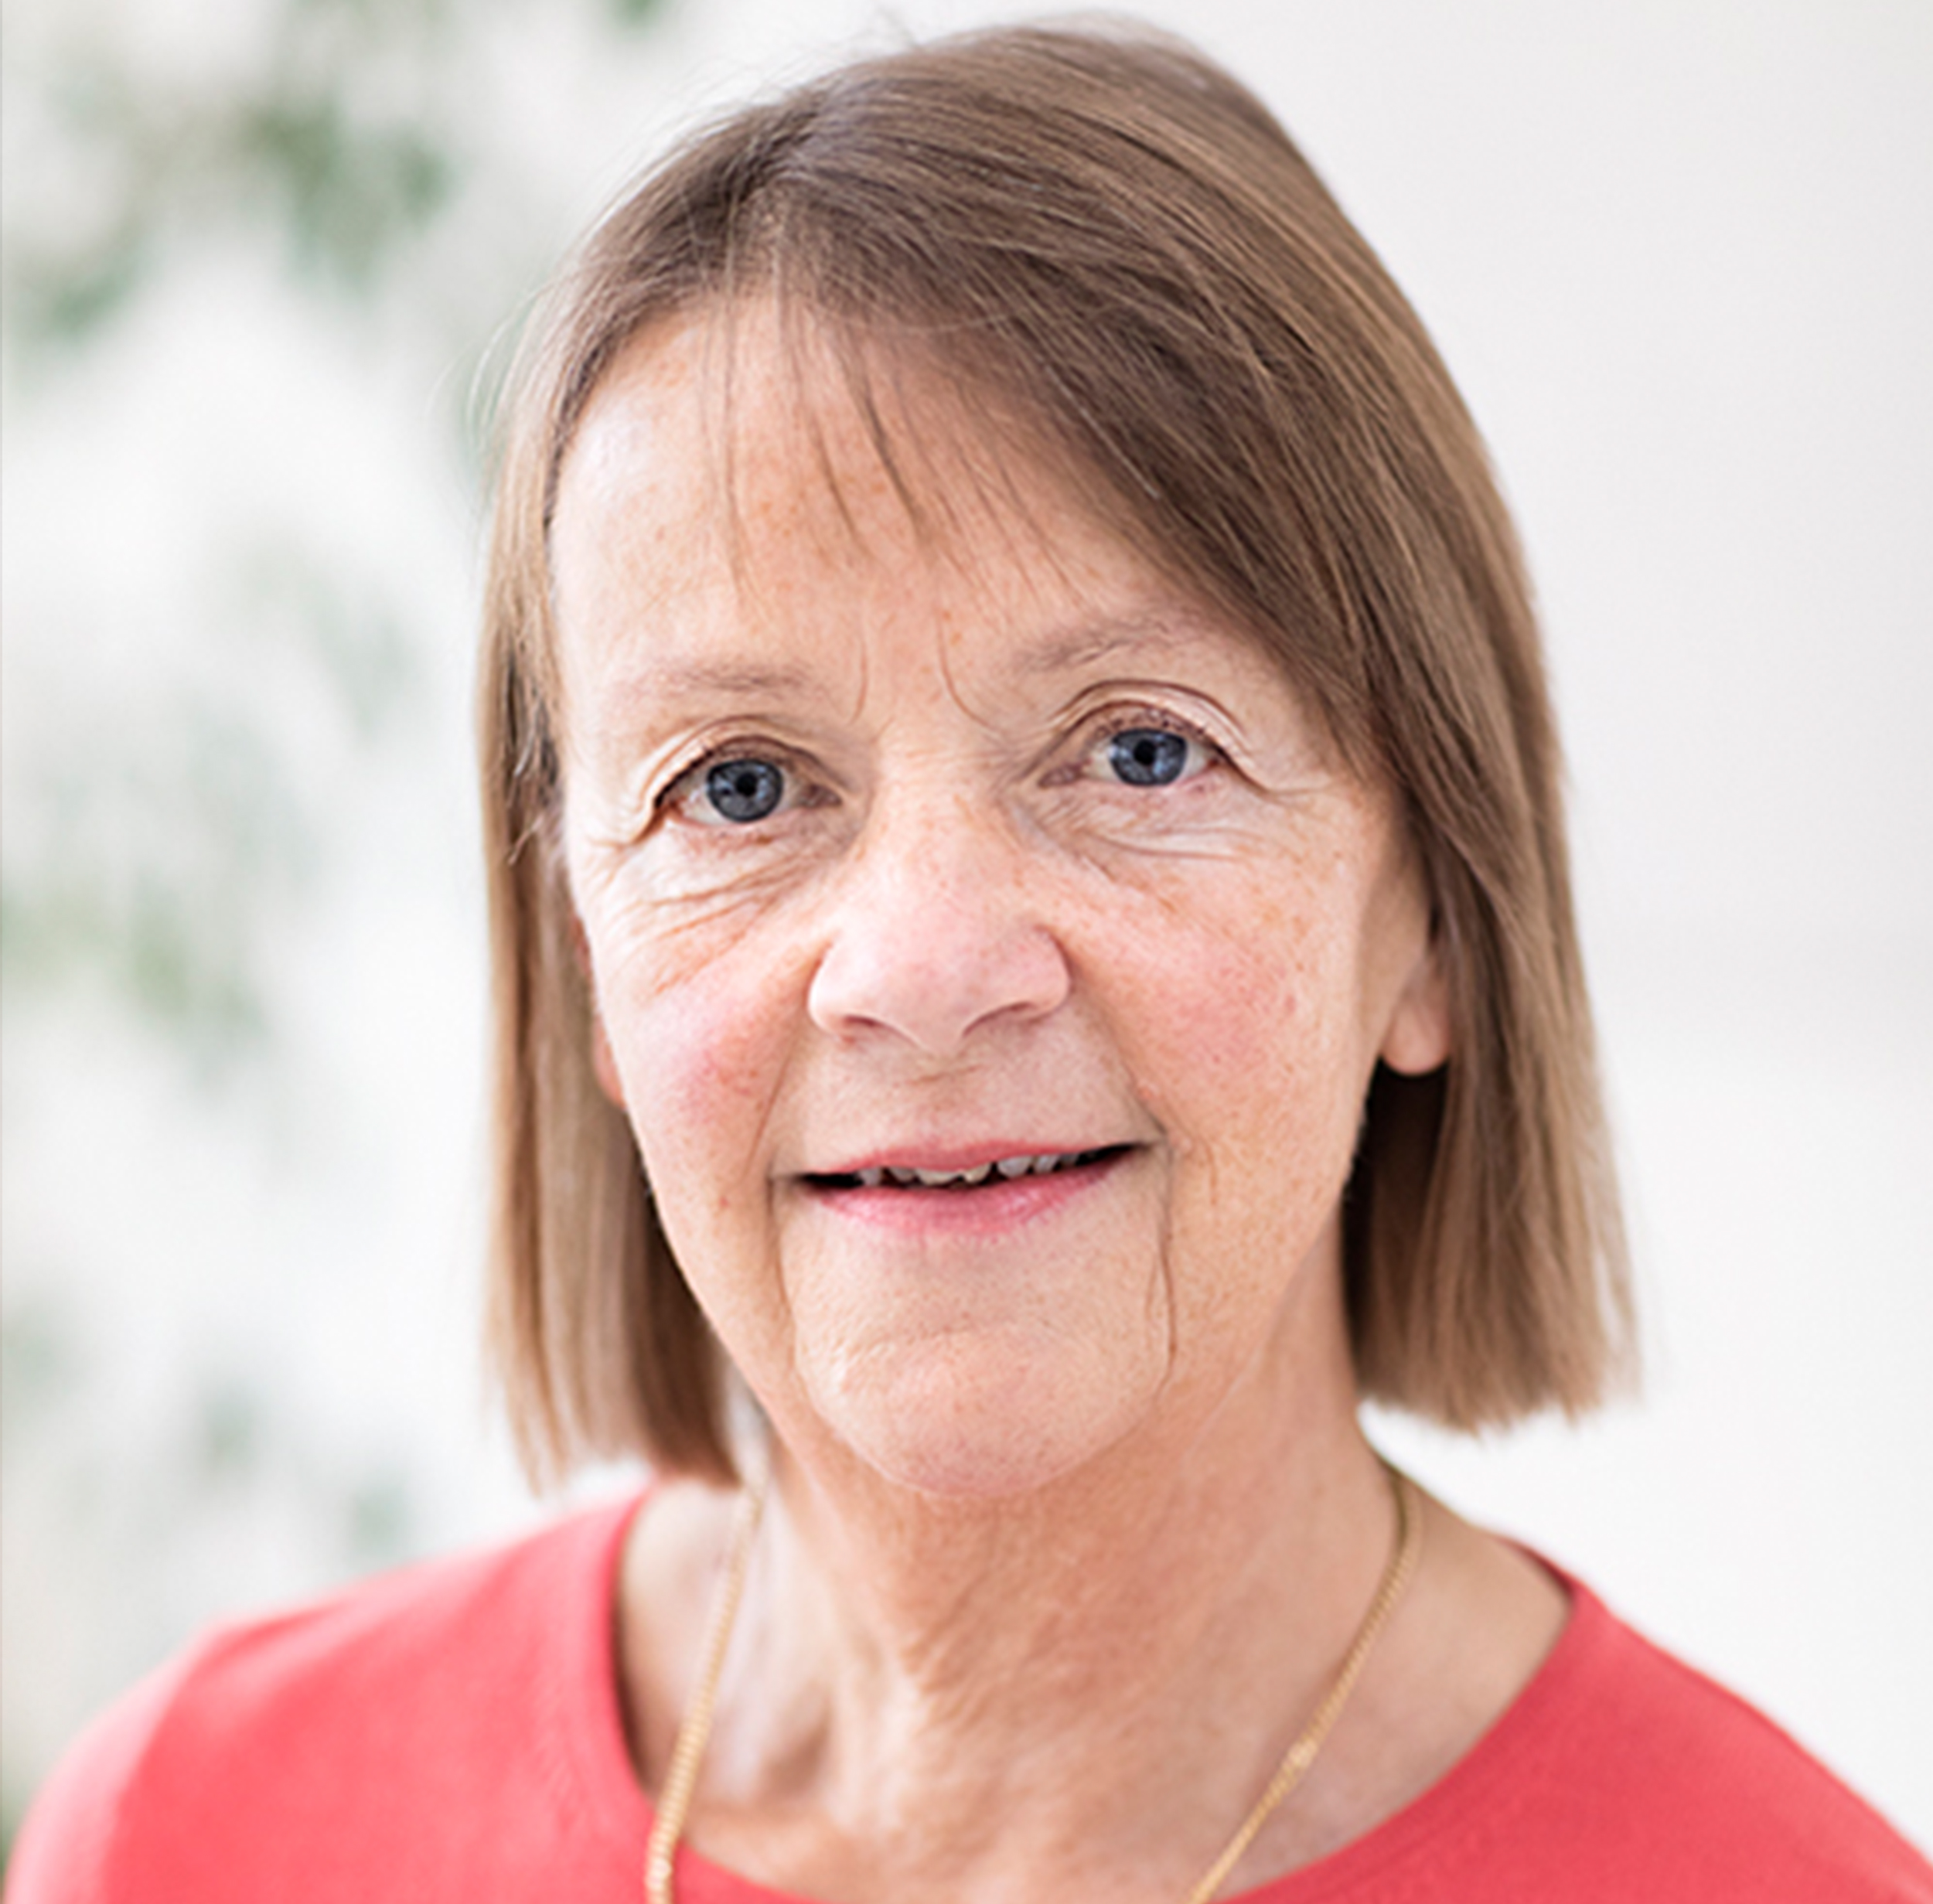 Amelie Pedersen KEMI kvadrat